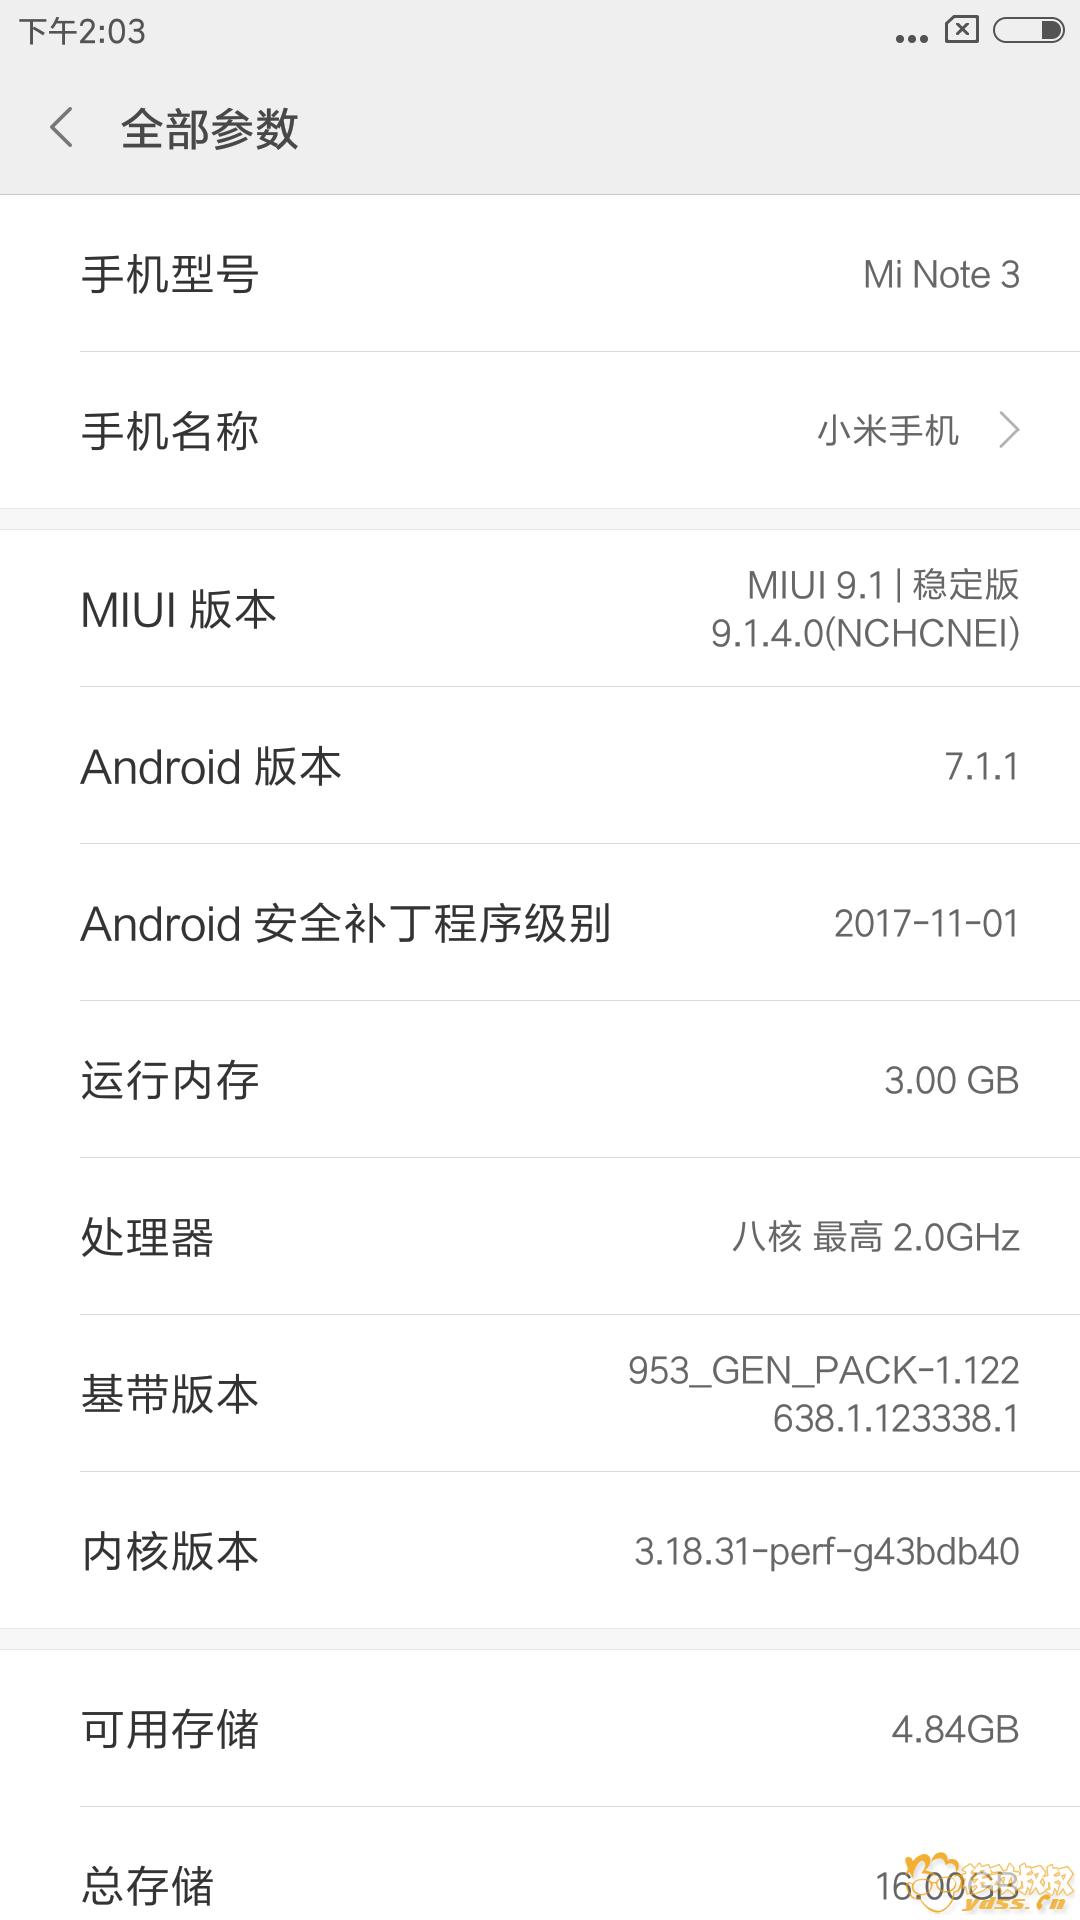 Screenshot_2017-12-25-14-03-39-688_com.android.settings.png